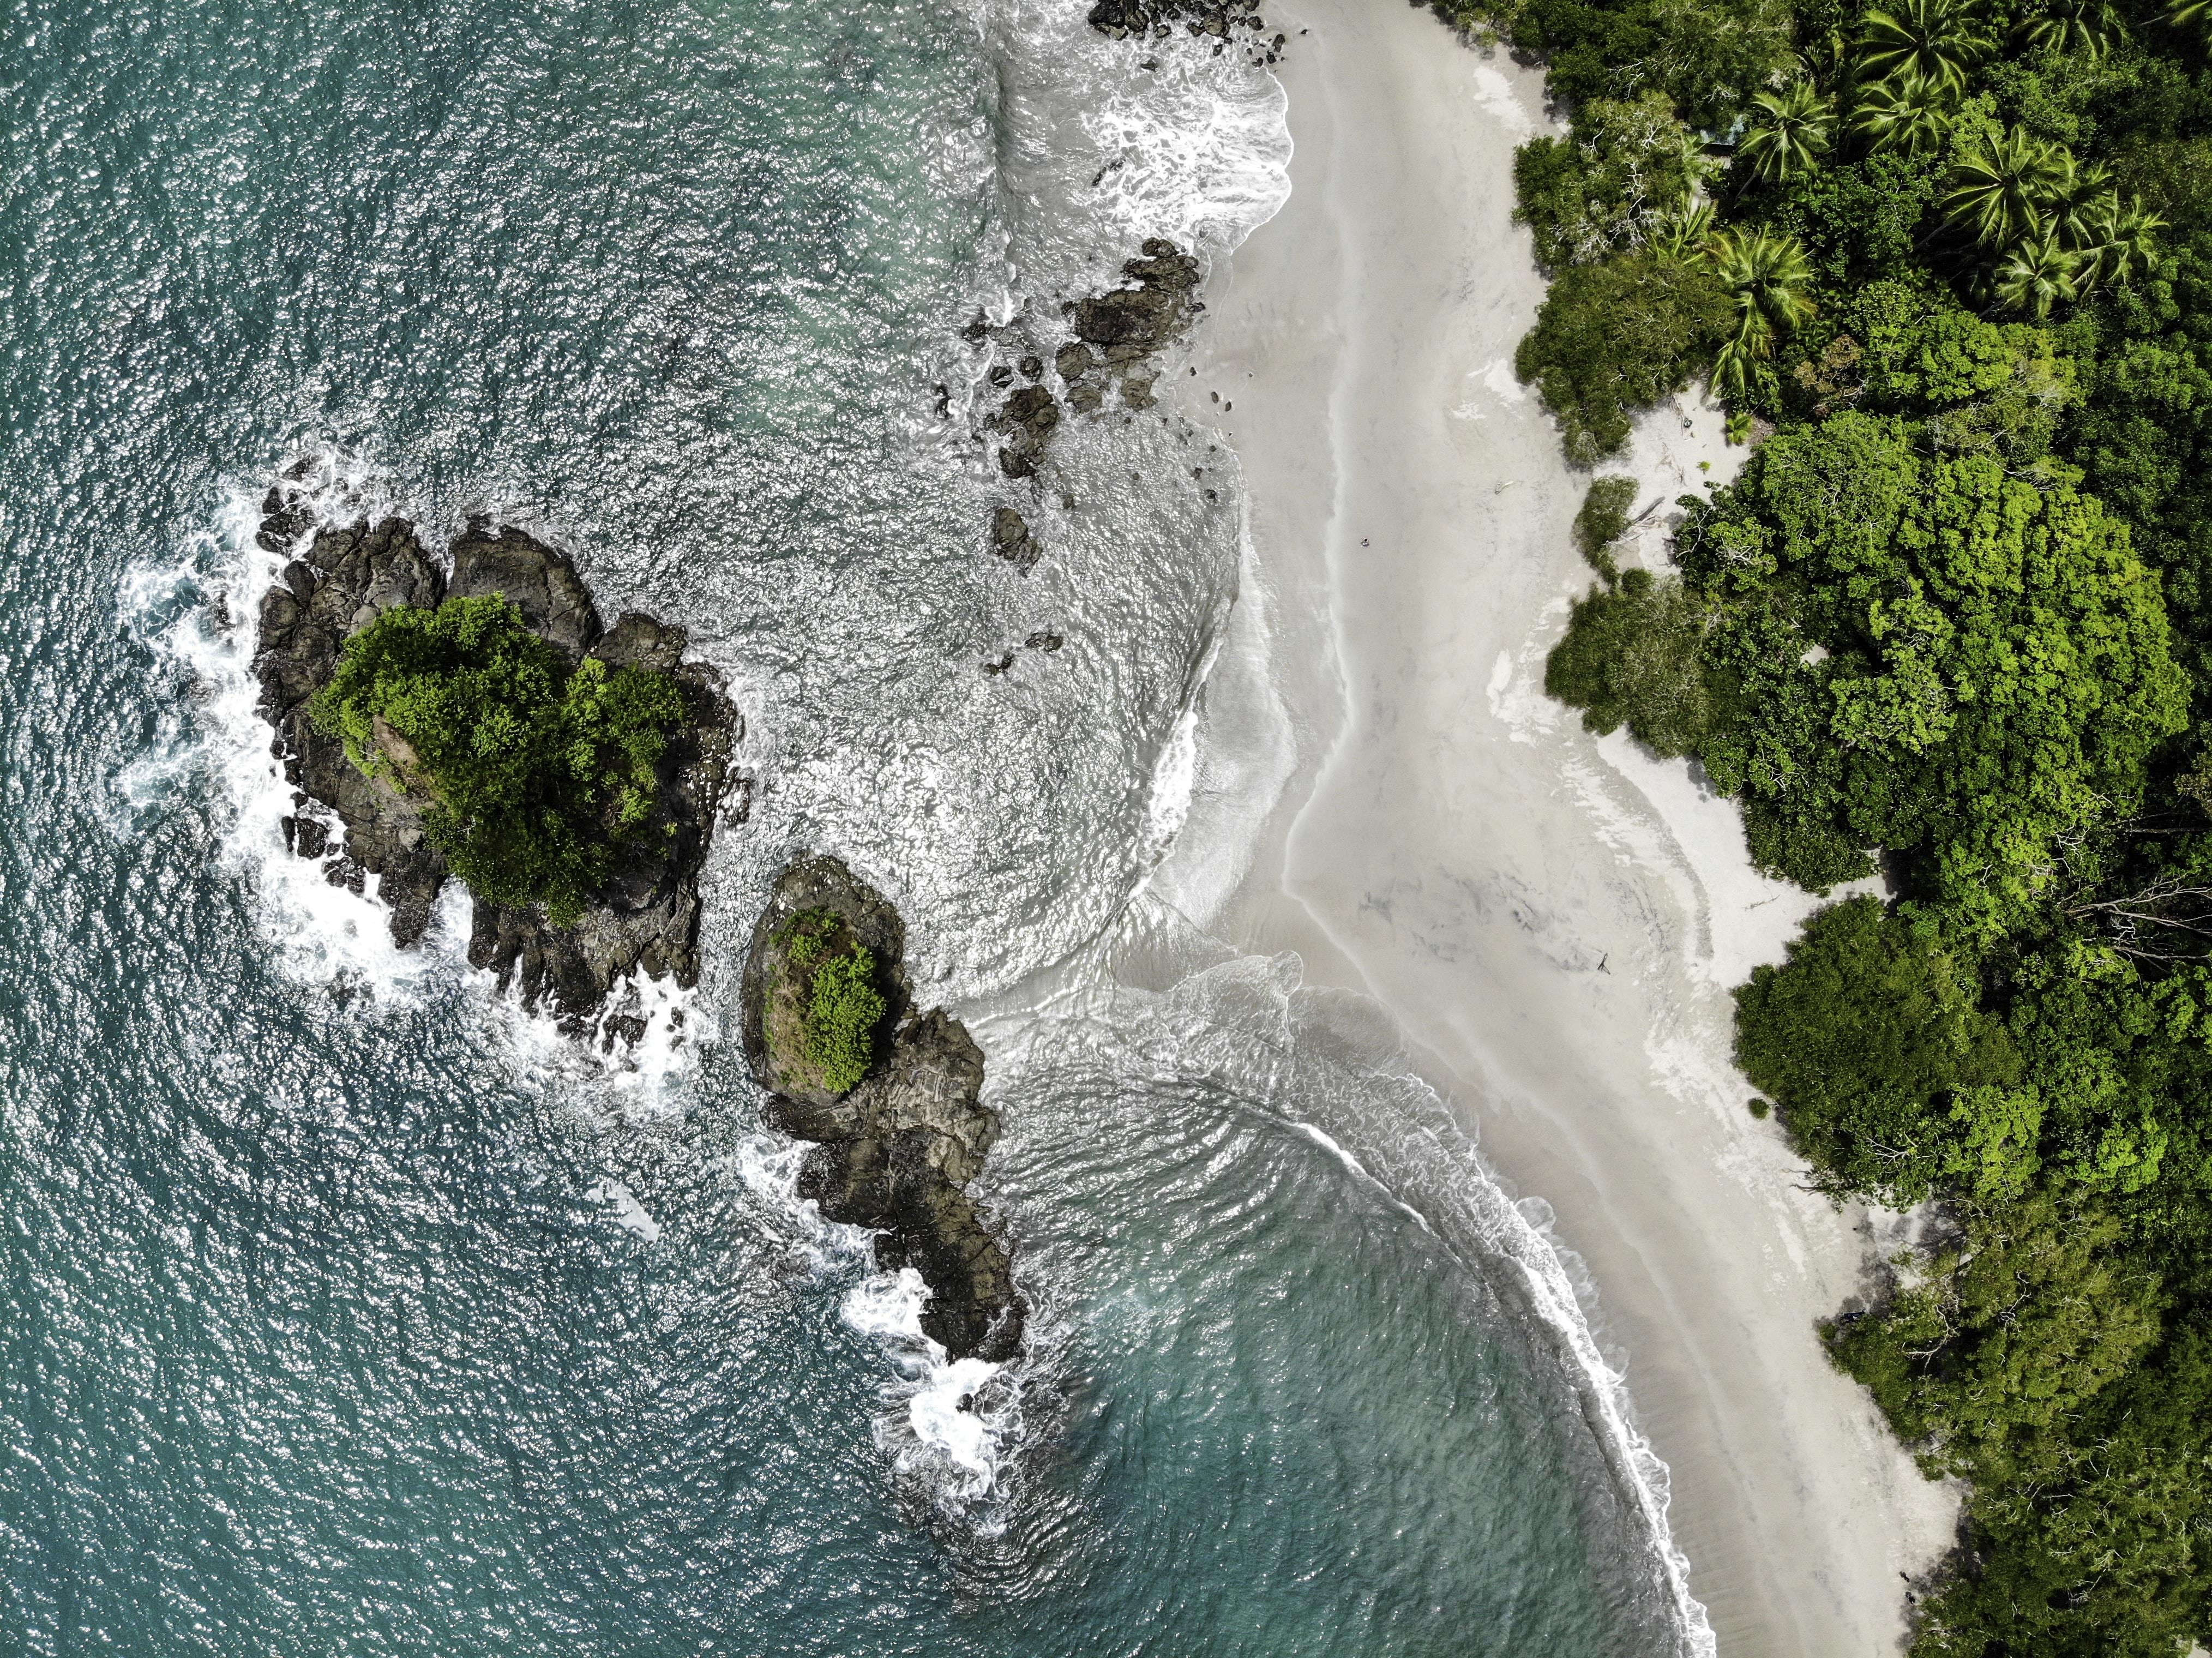 bird'-eye view photography of seashore